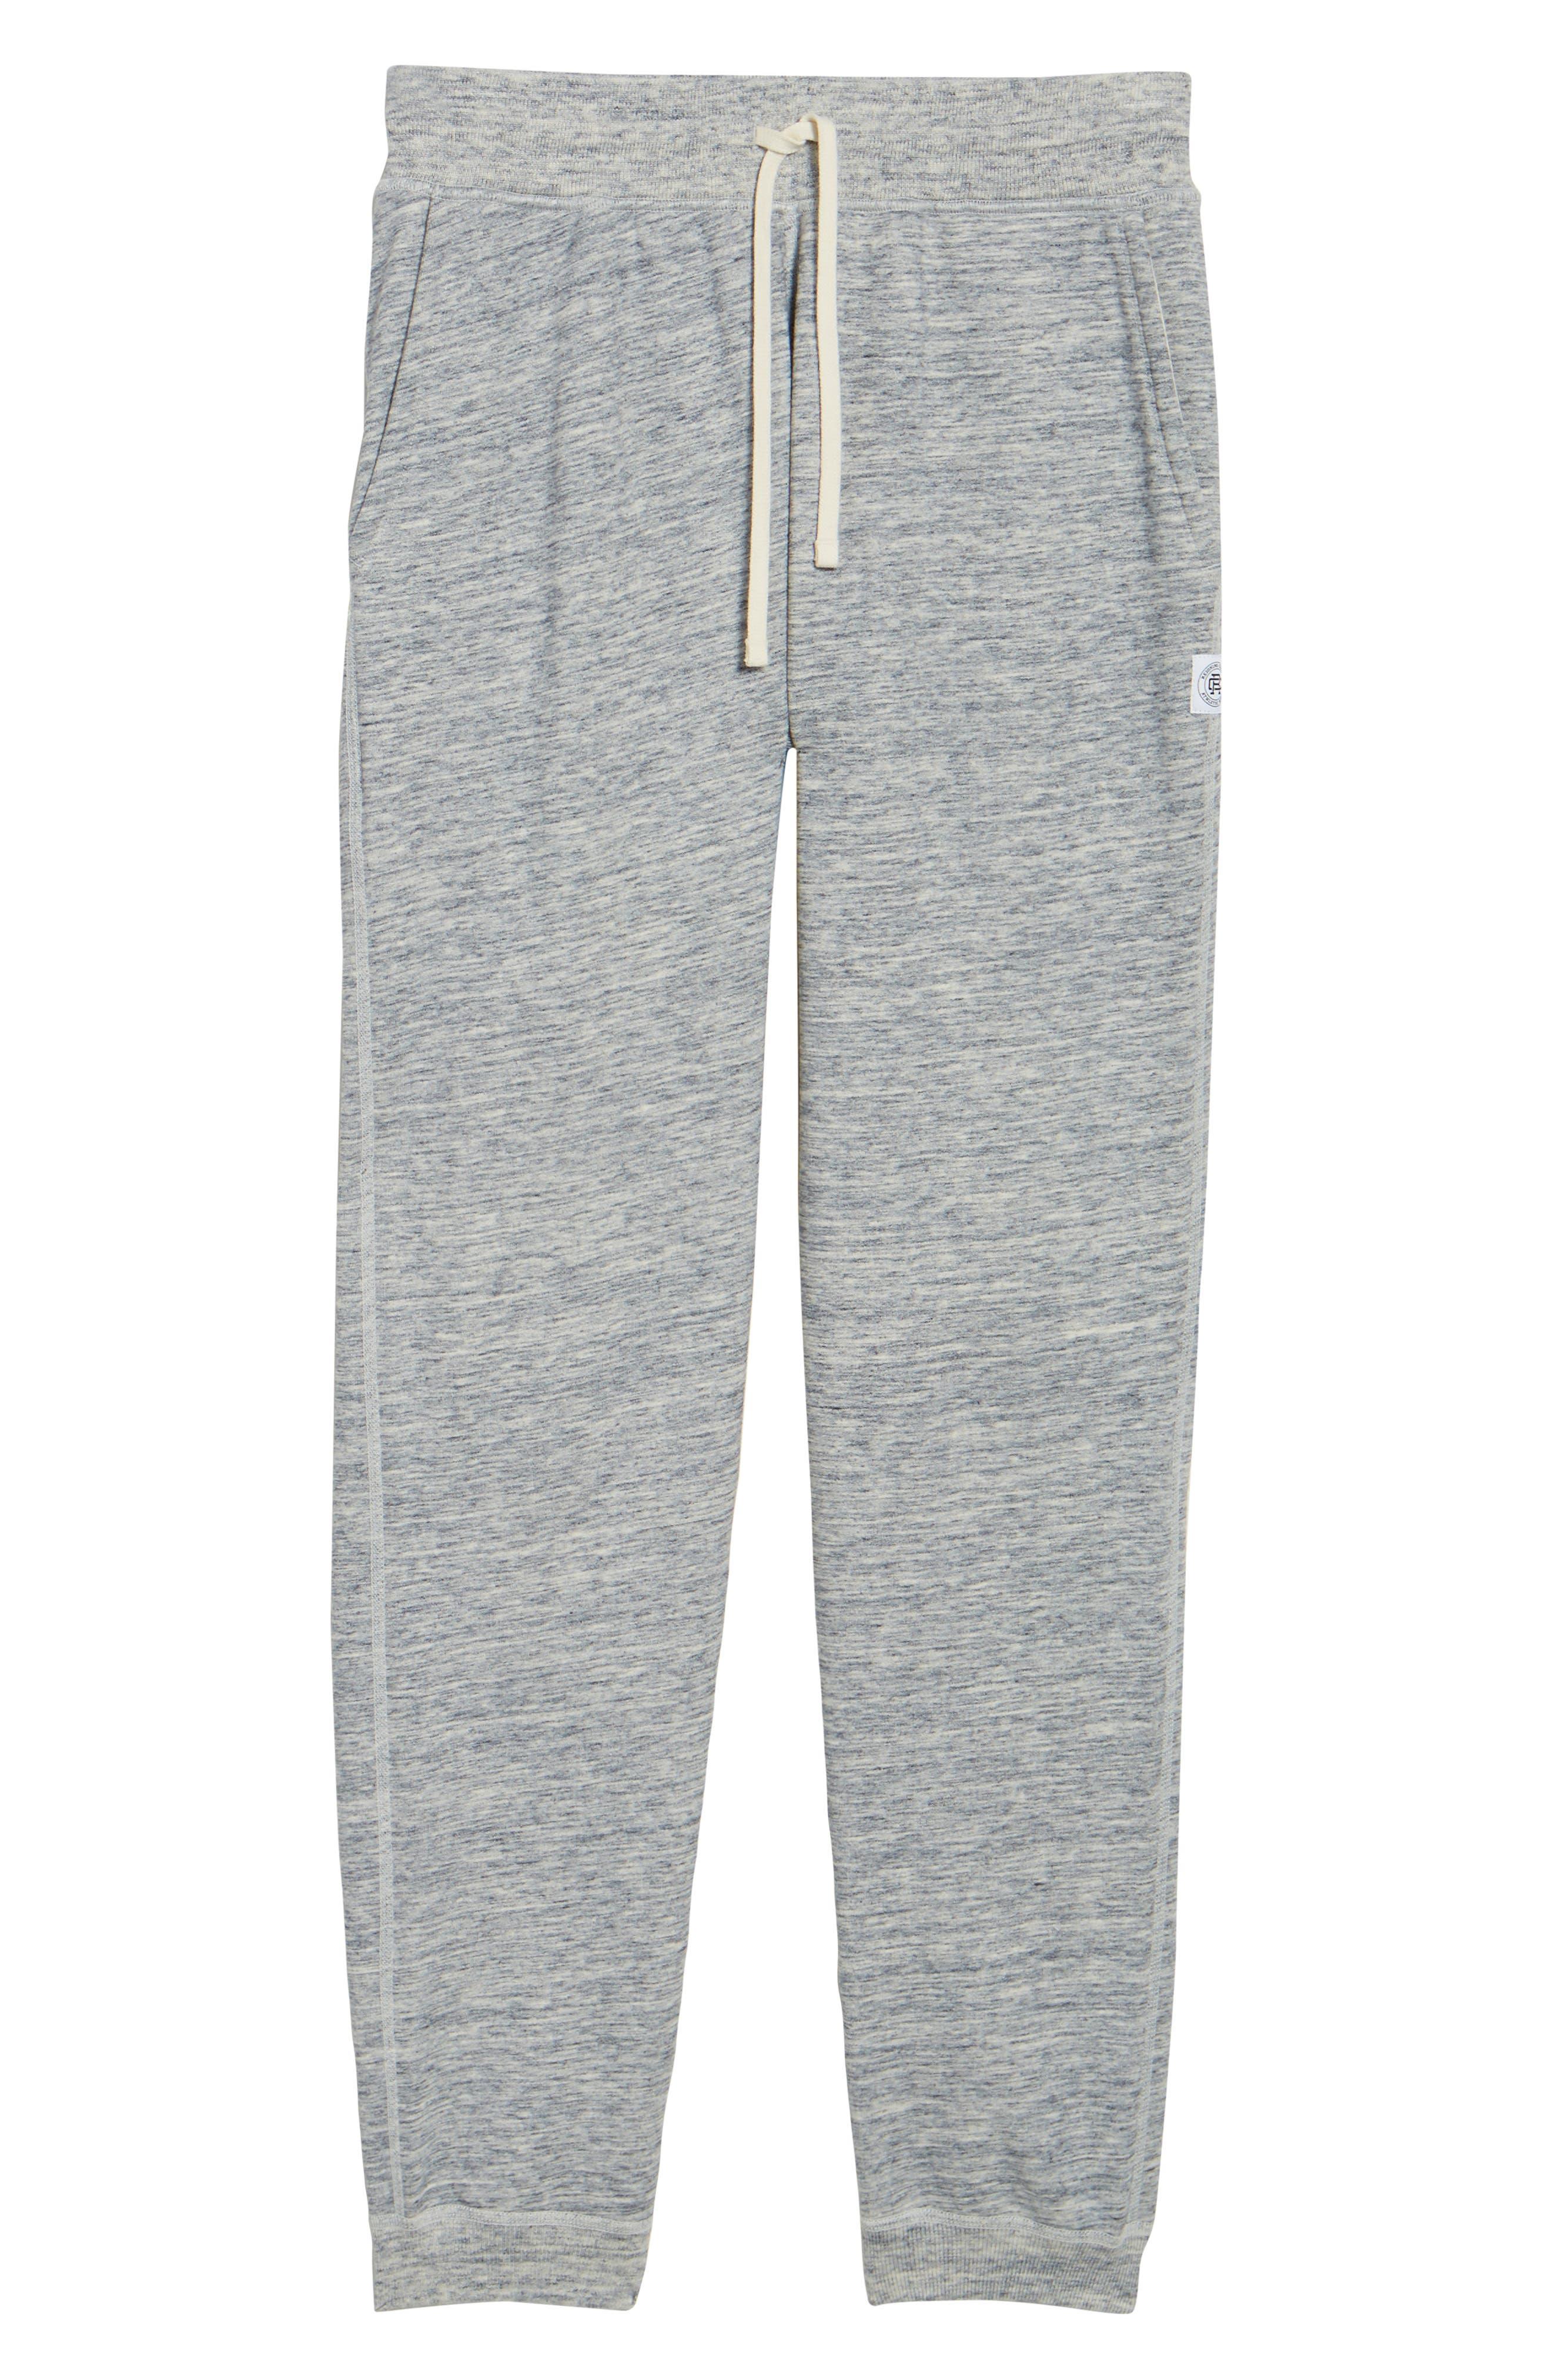 Slim Fit Sweatpants,                             Alternate thumbnail 25, color,